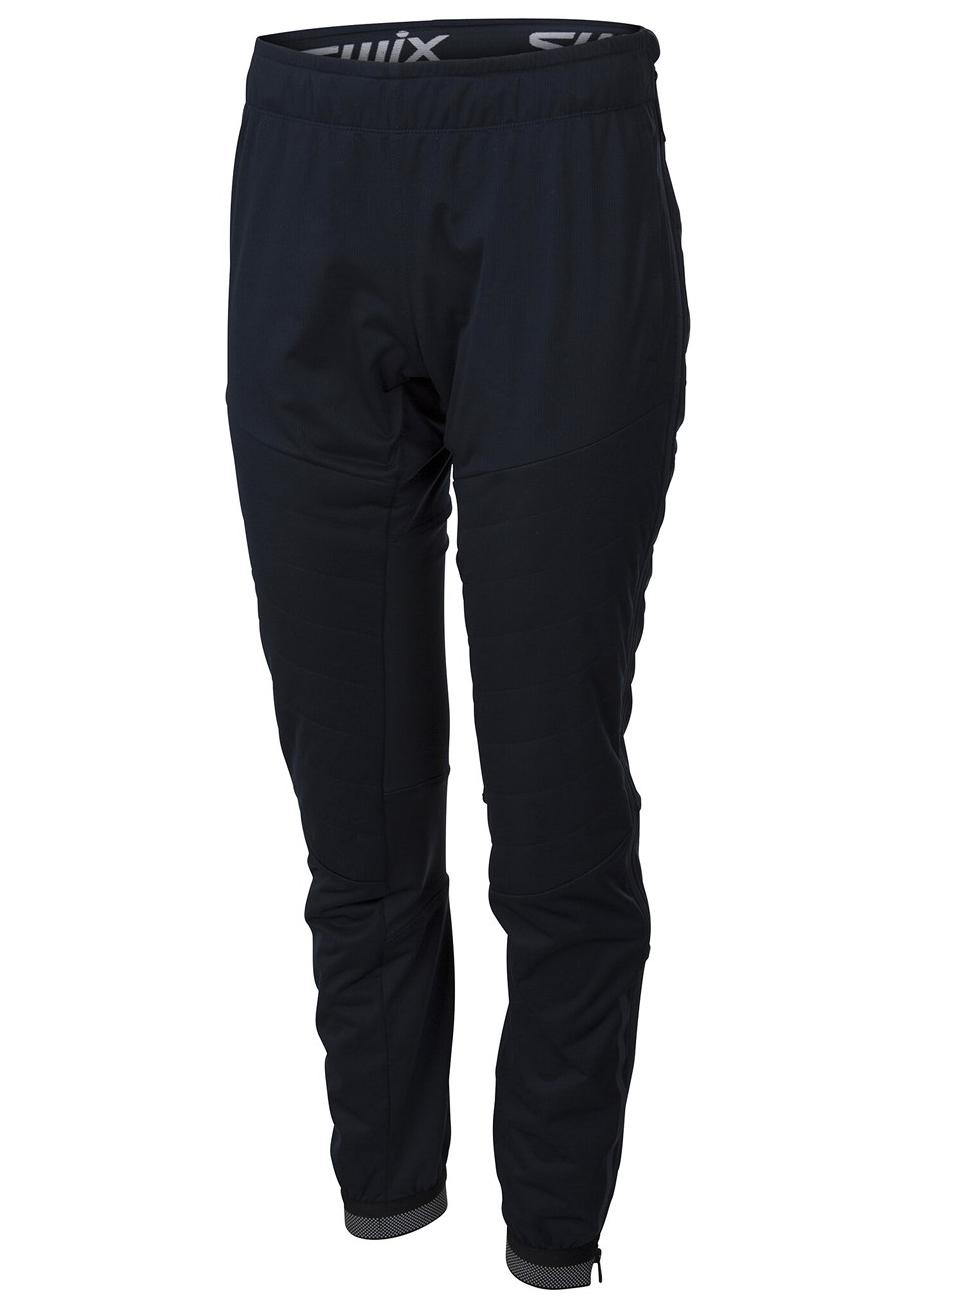 Bilde av Swix Blizzard XC pants W Dark Navy